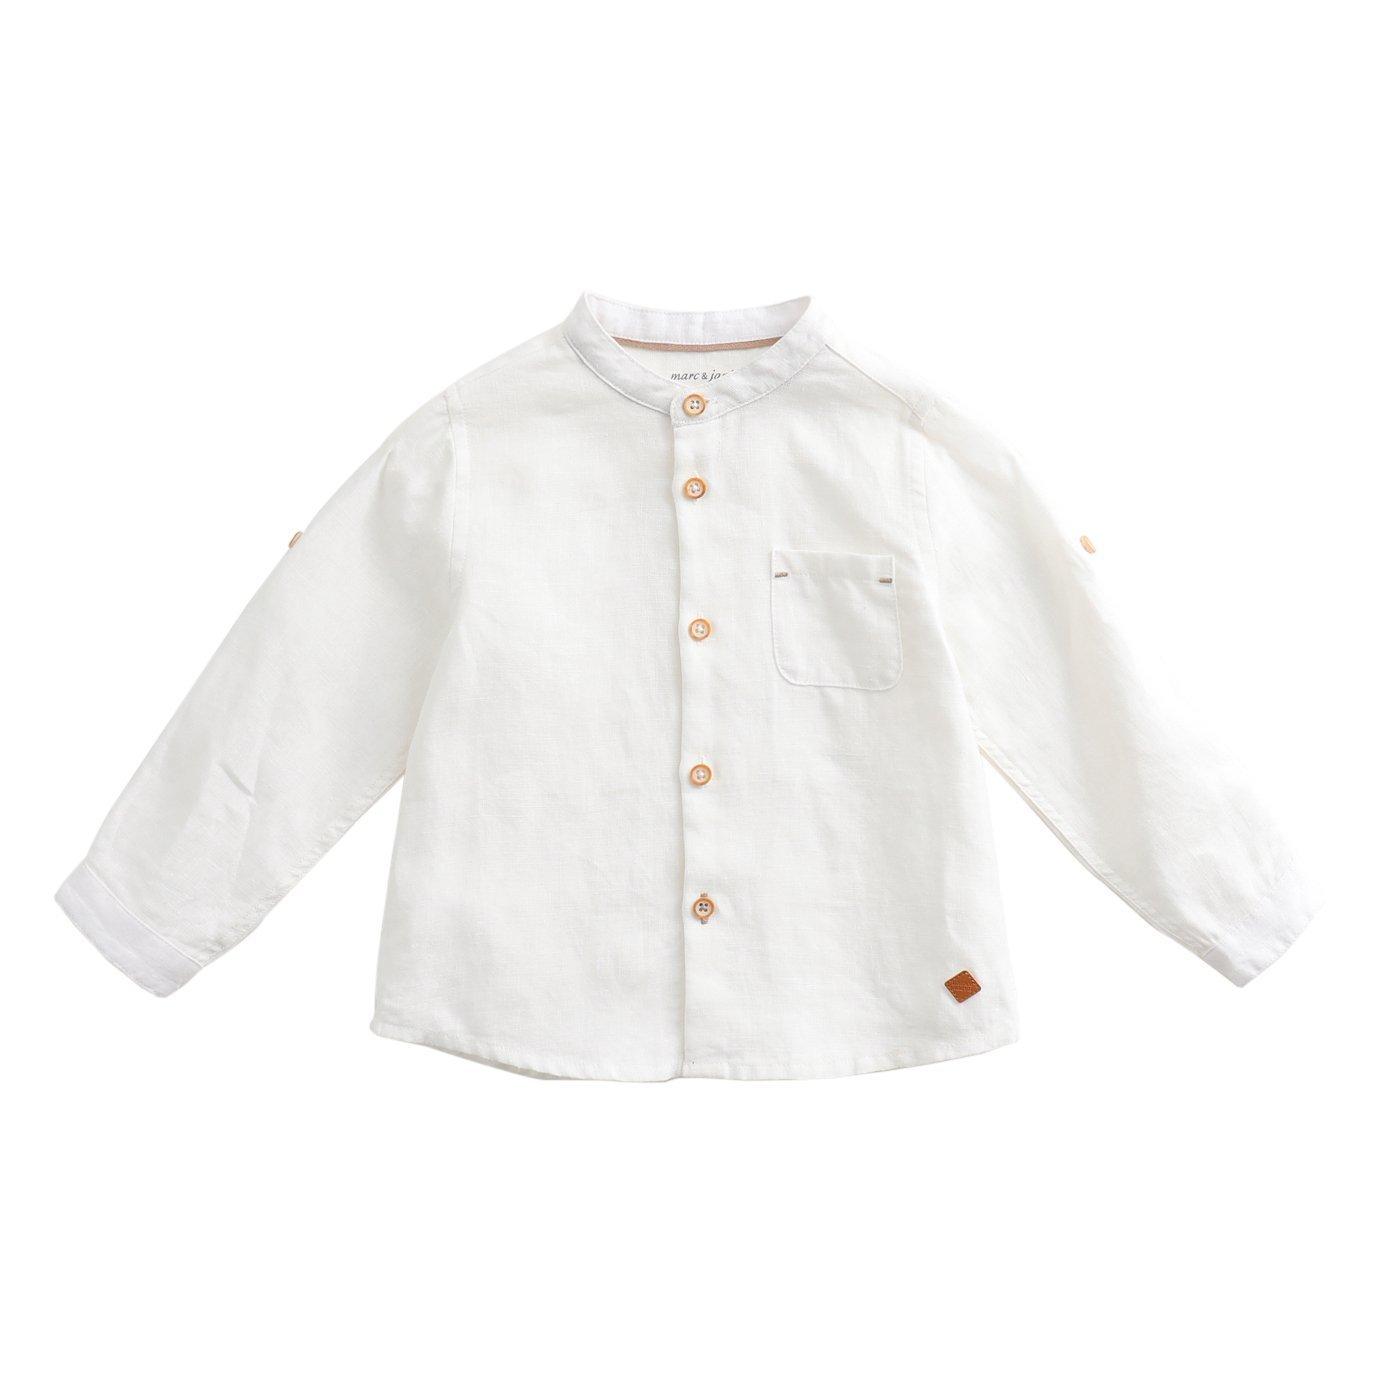 marc janie Spring Baby Boys Kids' Linen Shirt Solid Long Sleeve Button-Down Shirt MJ13202